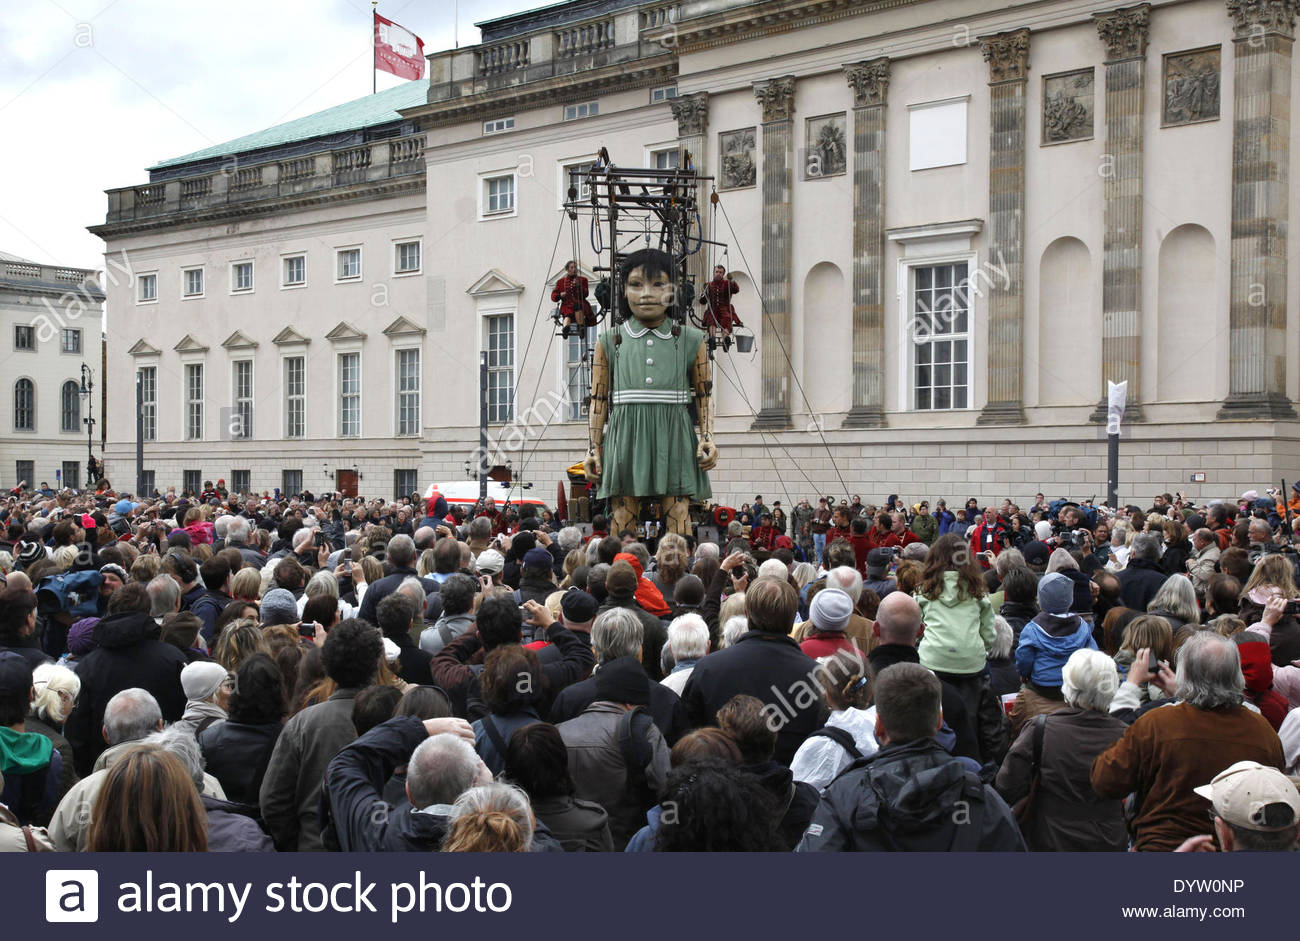 The Royal de Luxe theatre company - Stock Image